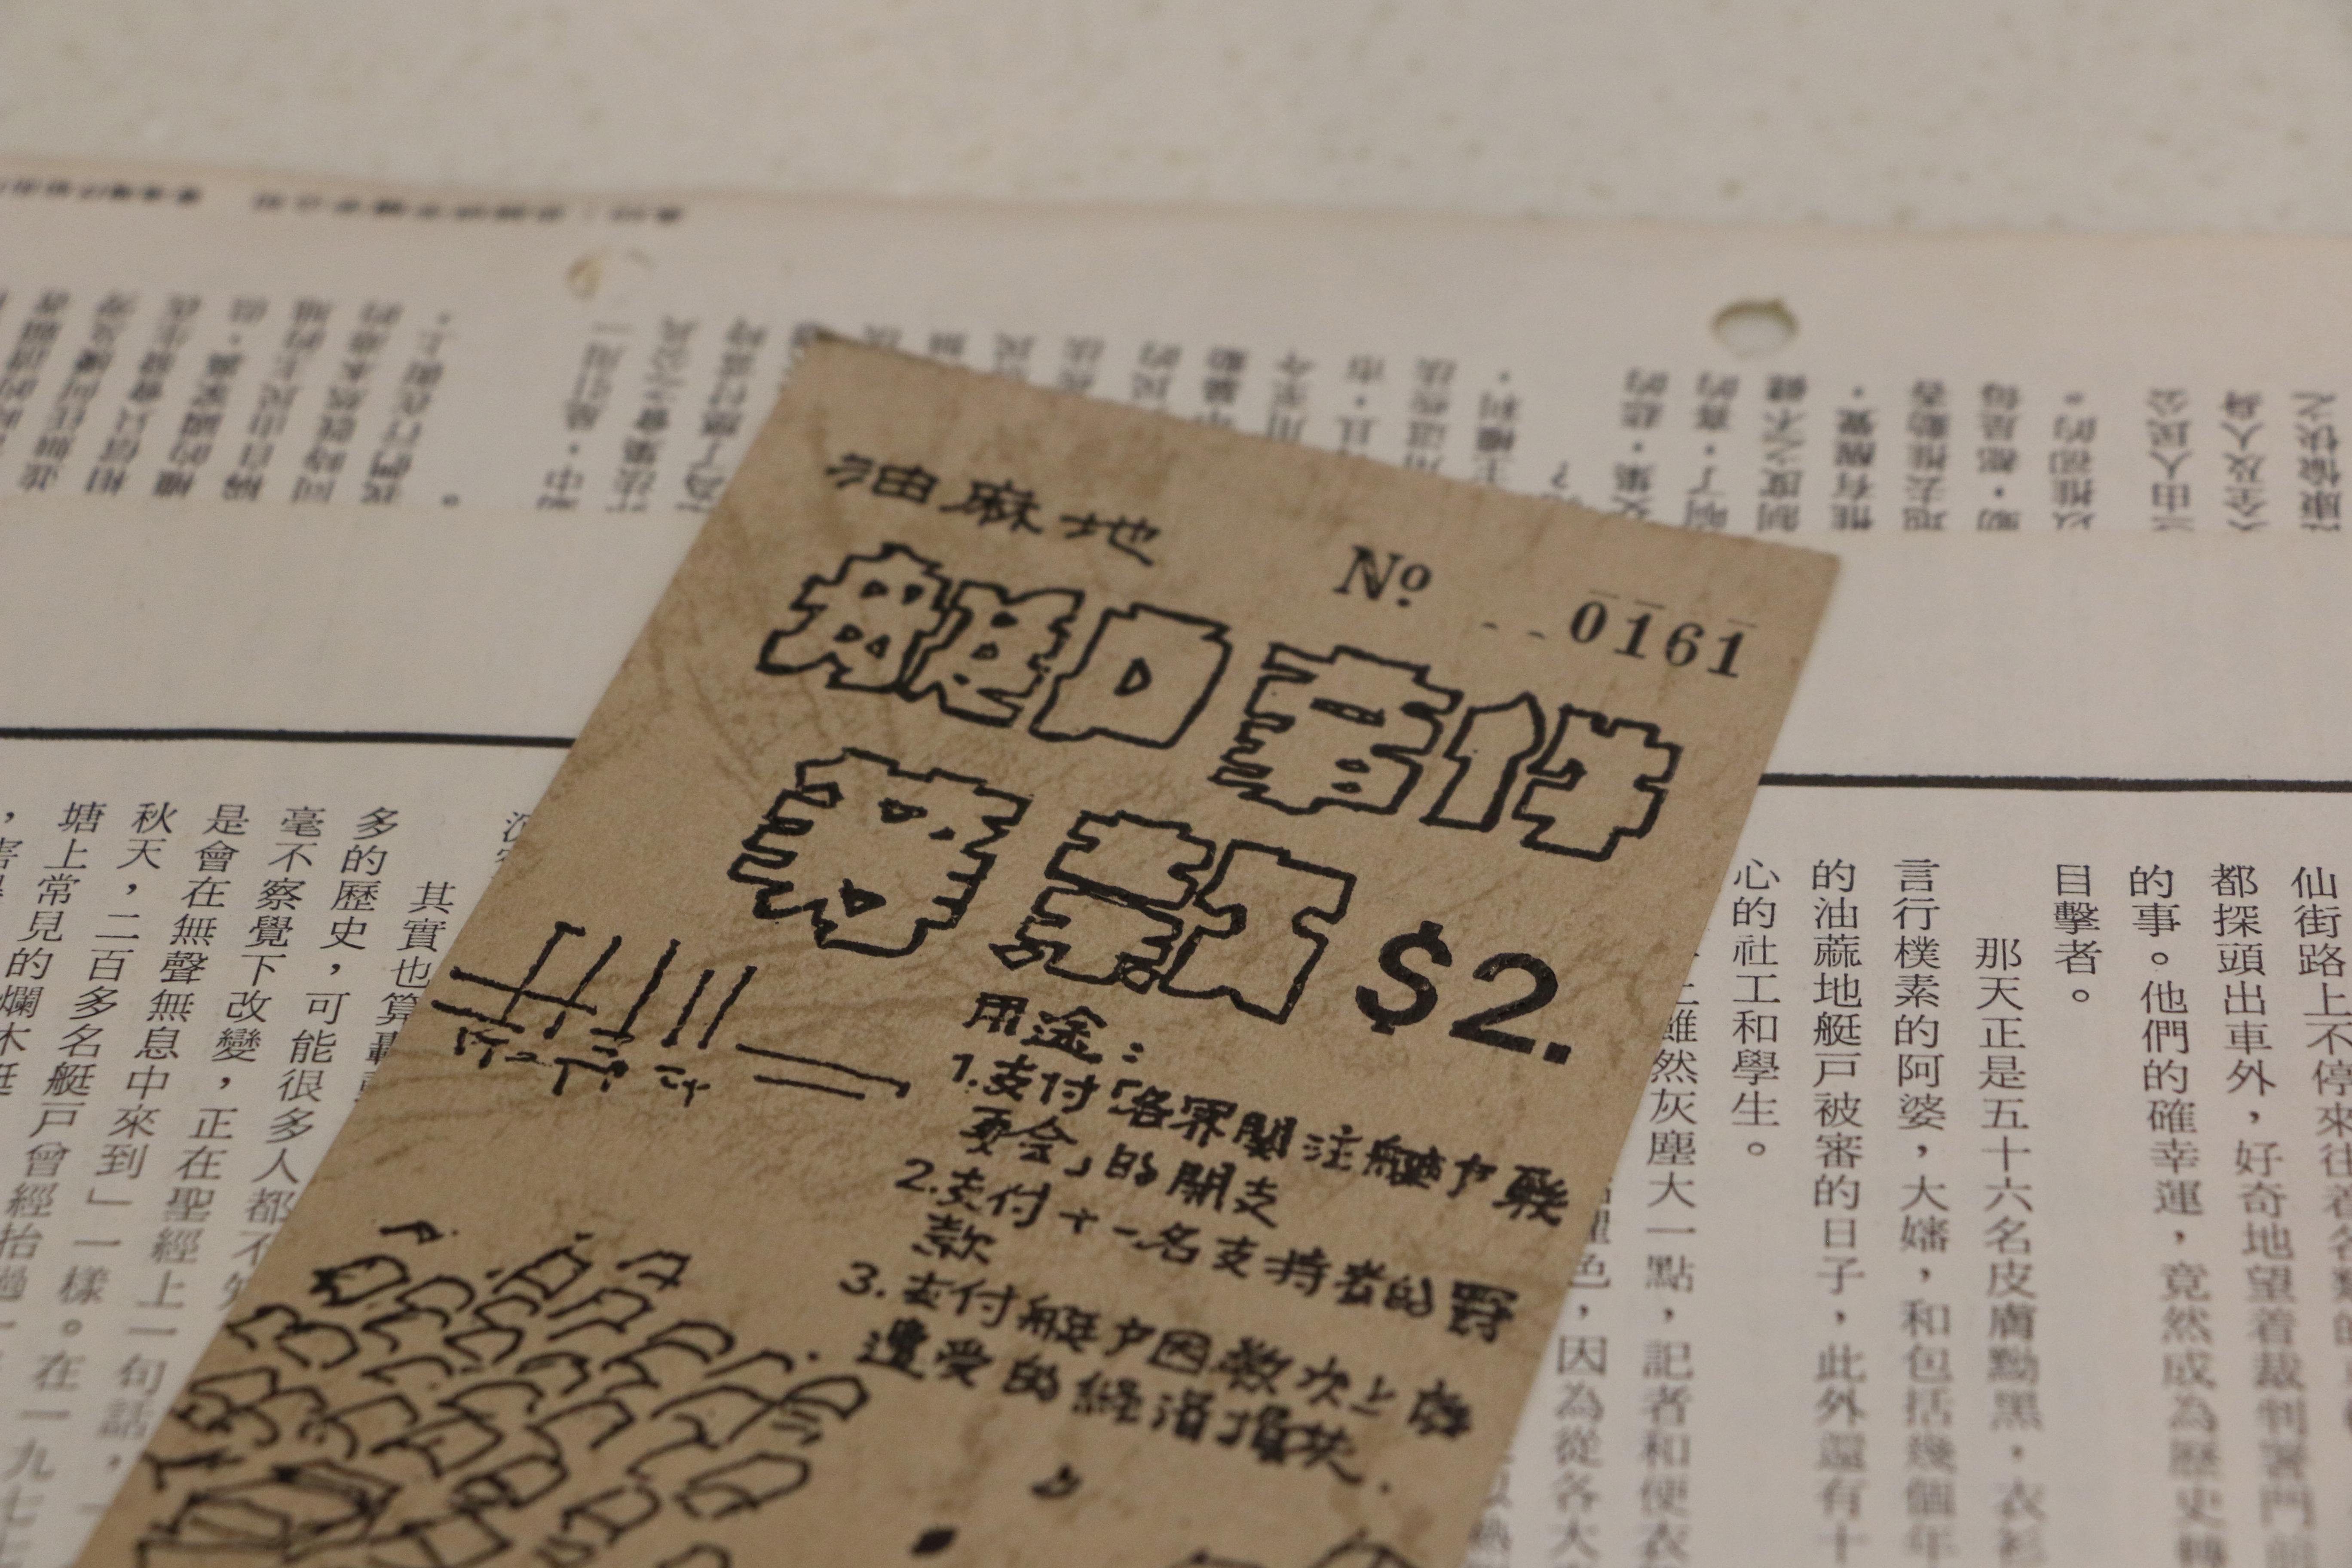 http://ubeat.com.cuhk.edu.hk/wp-content/uploads/2018/134_history_slider_9.jpg